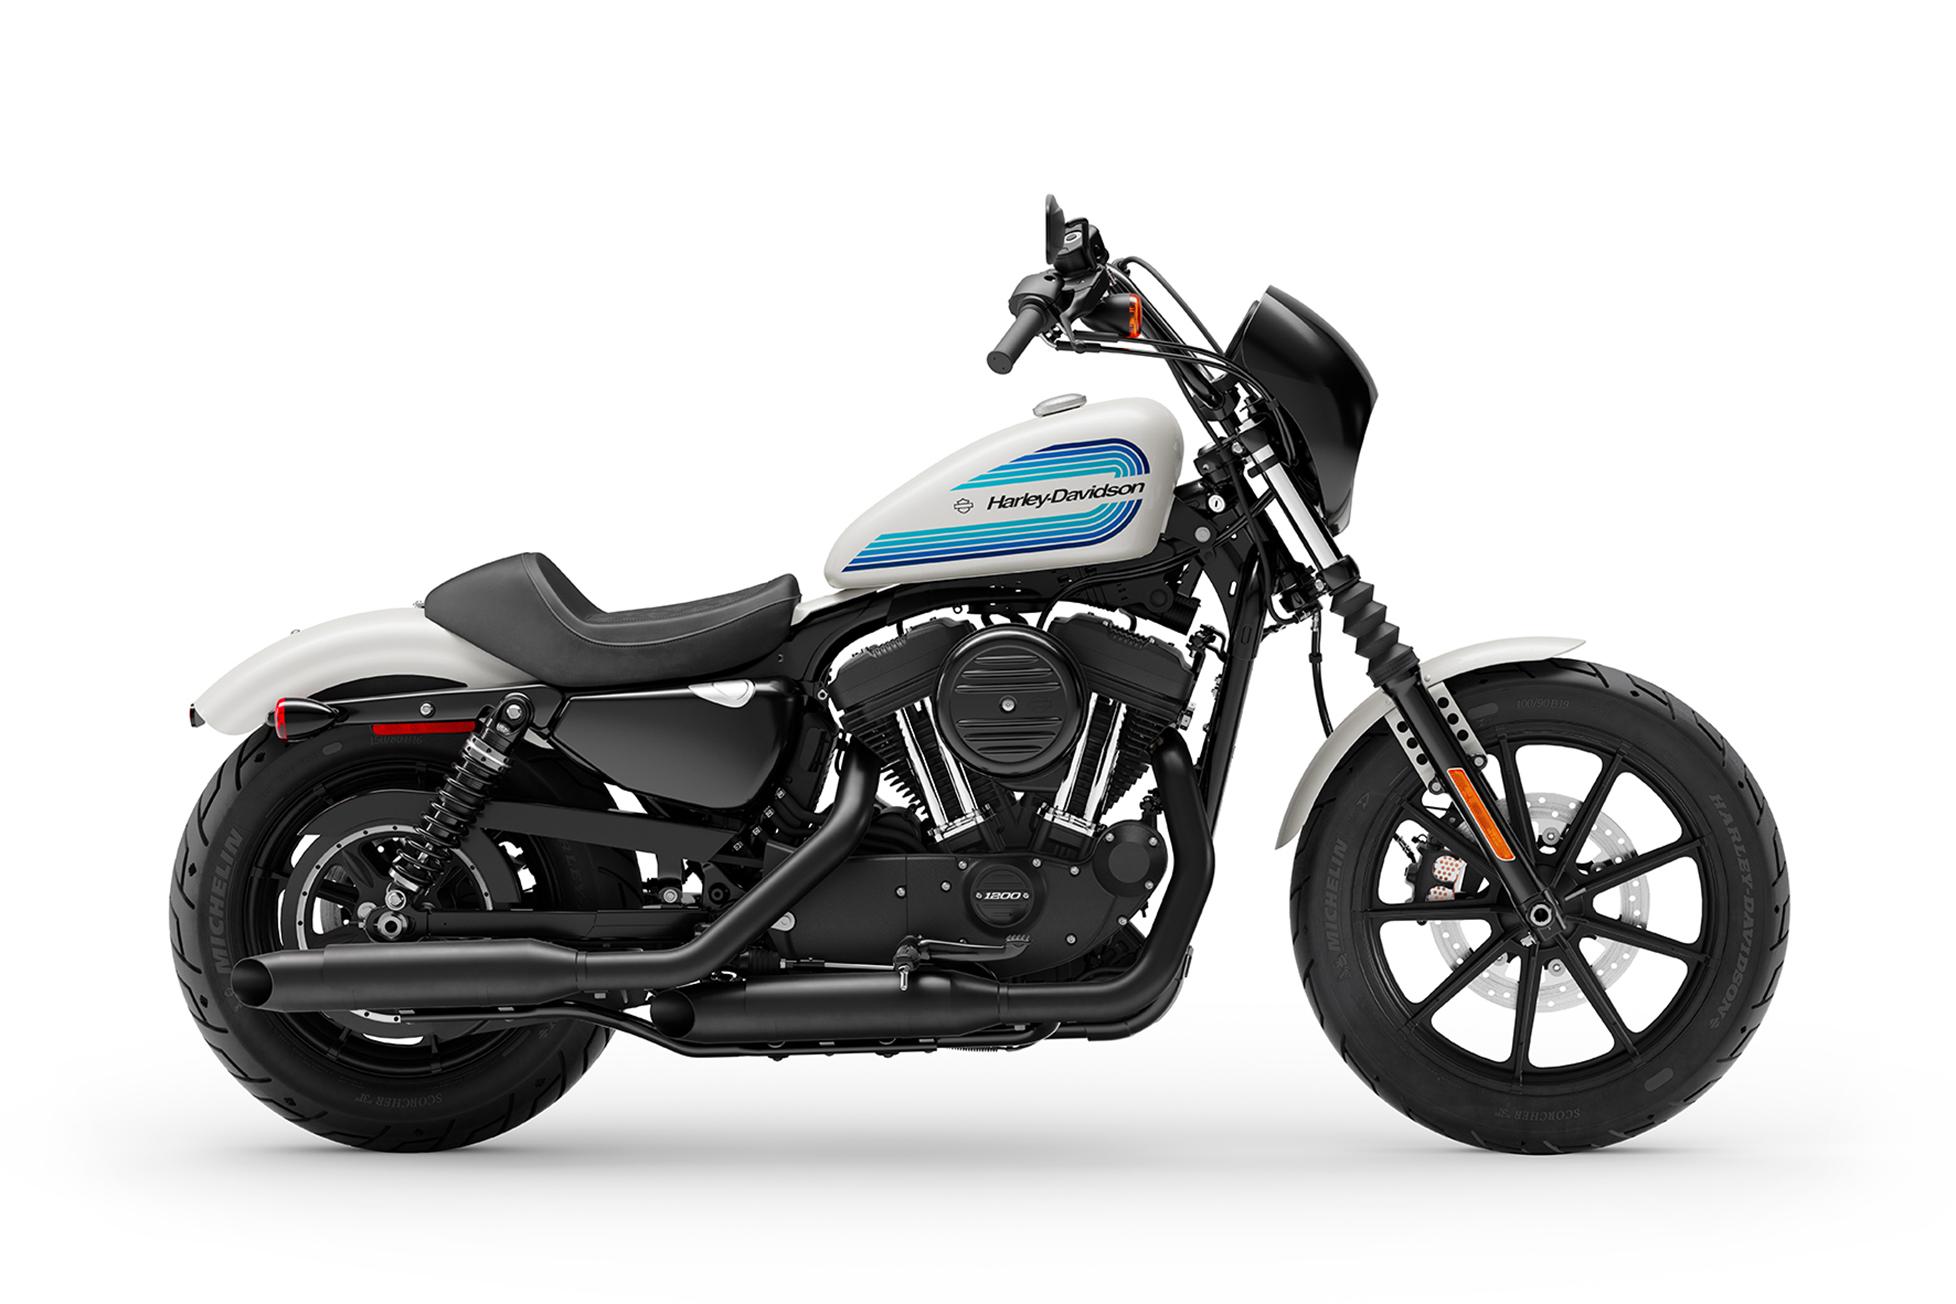 2019 iron 1200 motorcycle specs pricing harley davidson usa rh harley davidson com Sportster 1200C Review Sportster 1200 Wallpaper